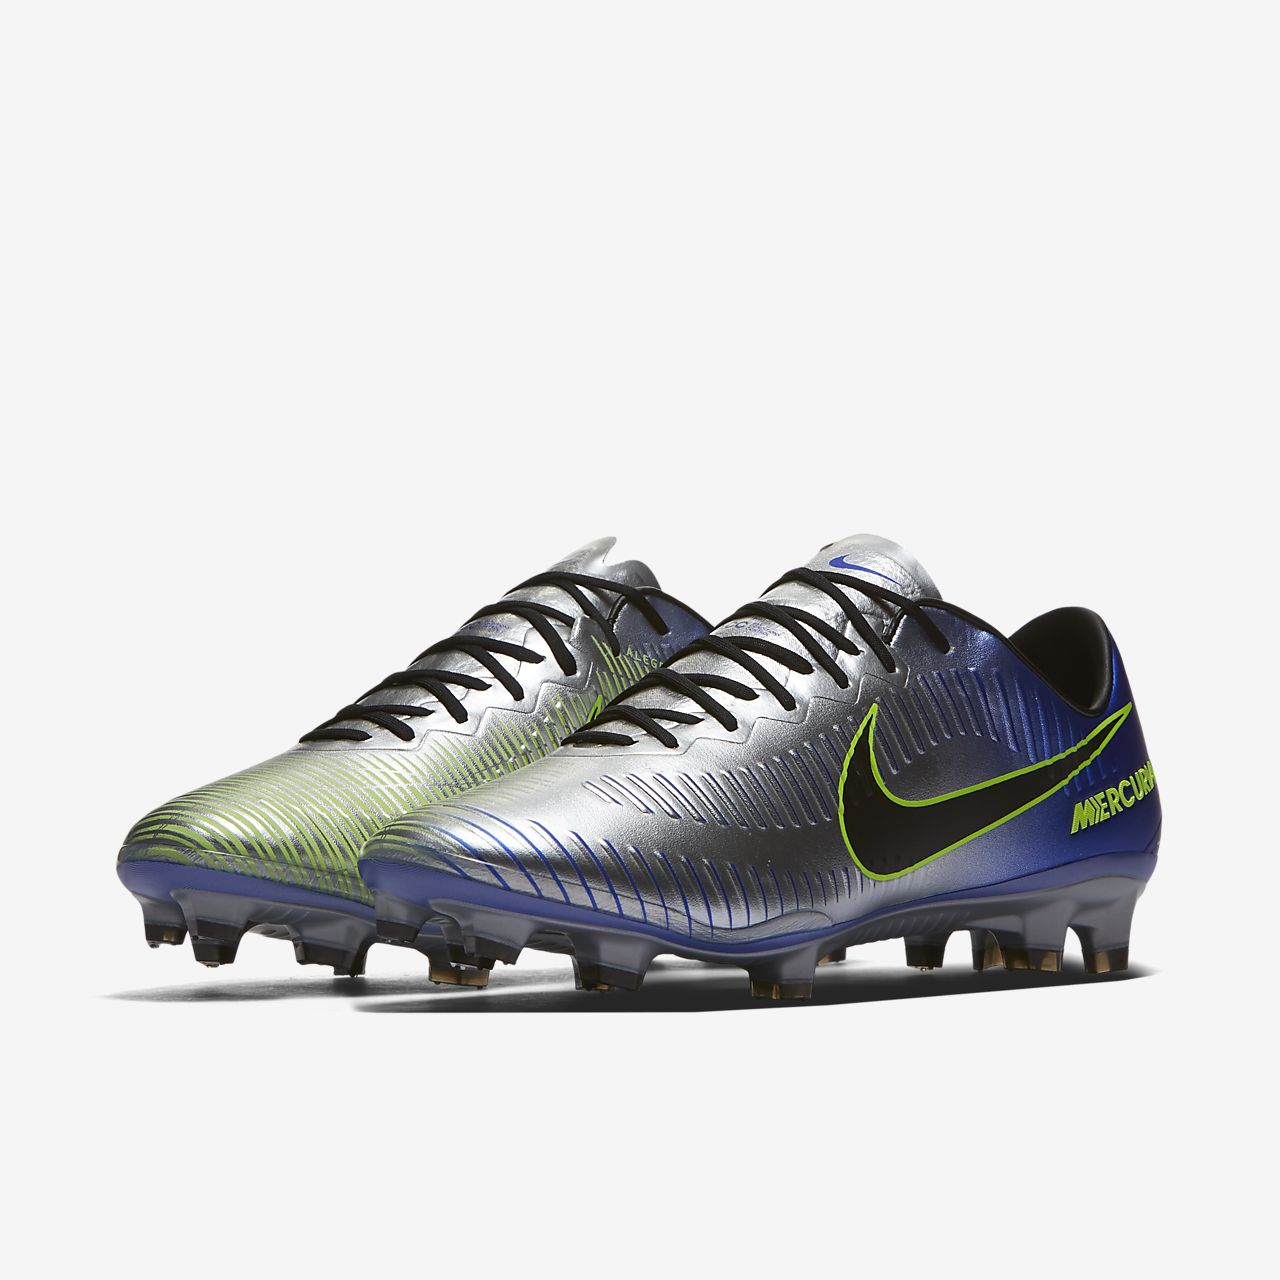 big sale 736b6 2e56f scarpa-da-calcio-per-terreni-duri-mercurial-vapor-xi-neymar-DsW75G.jpg